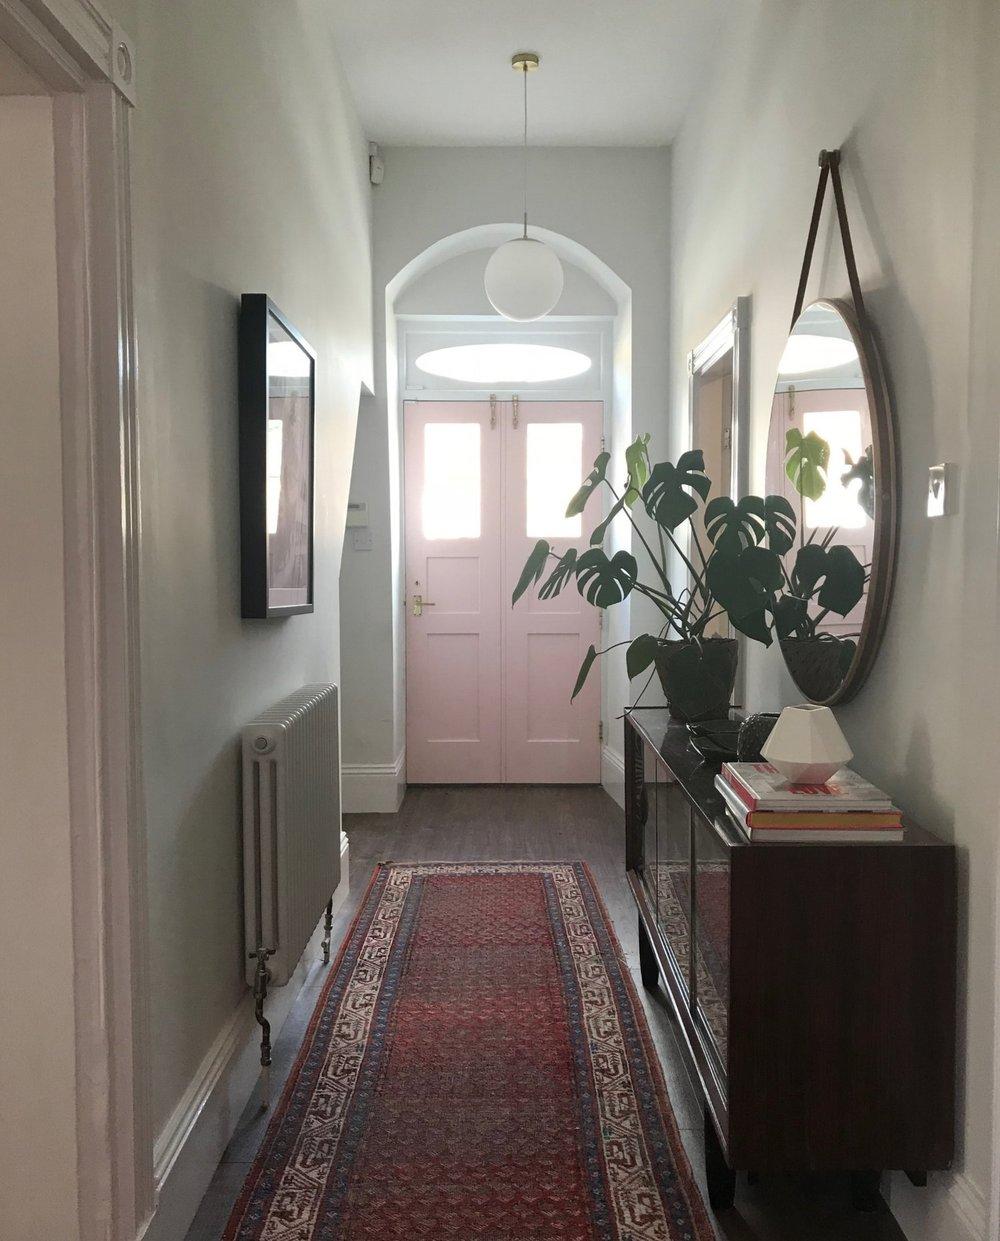 The rear hallway.